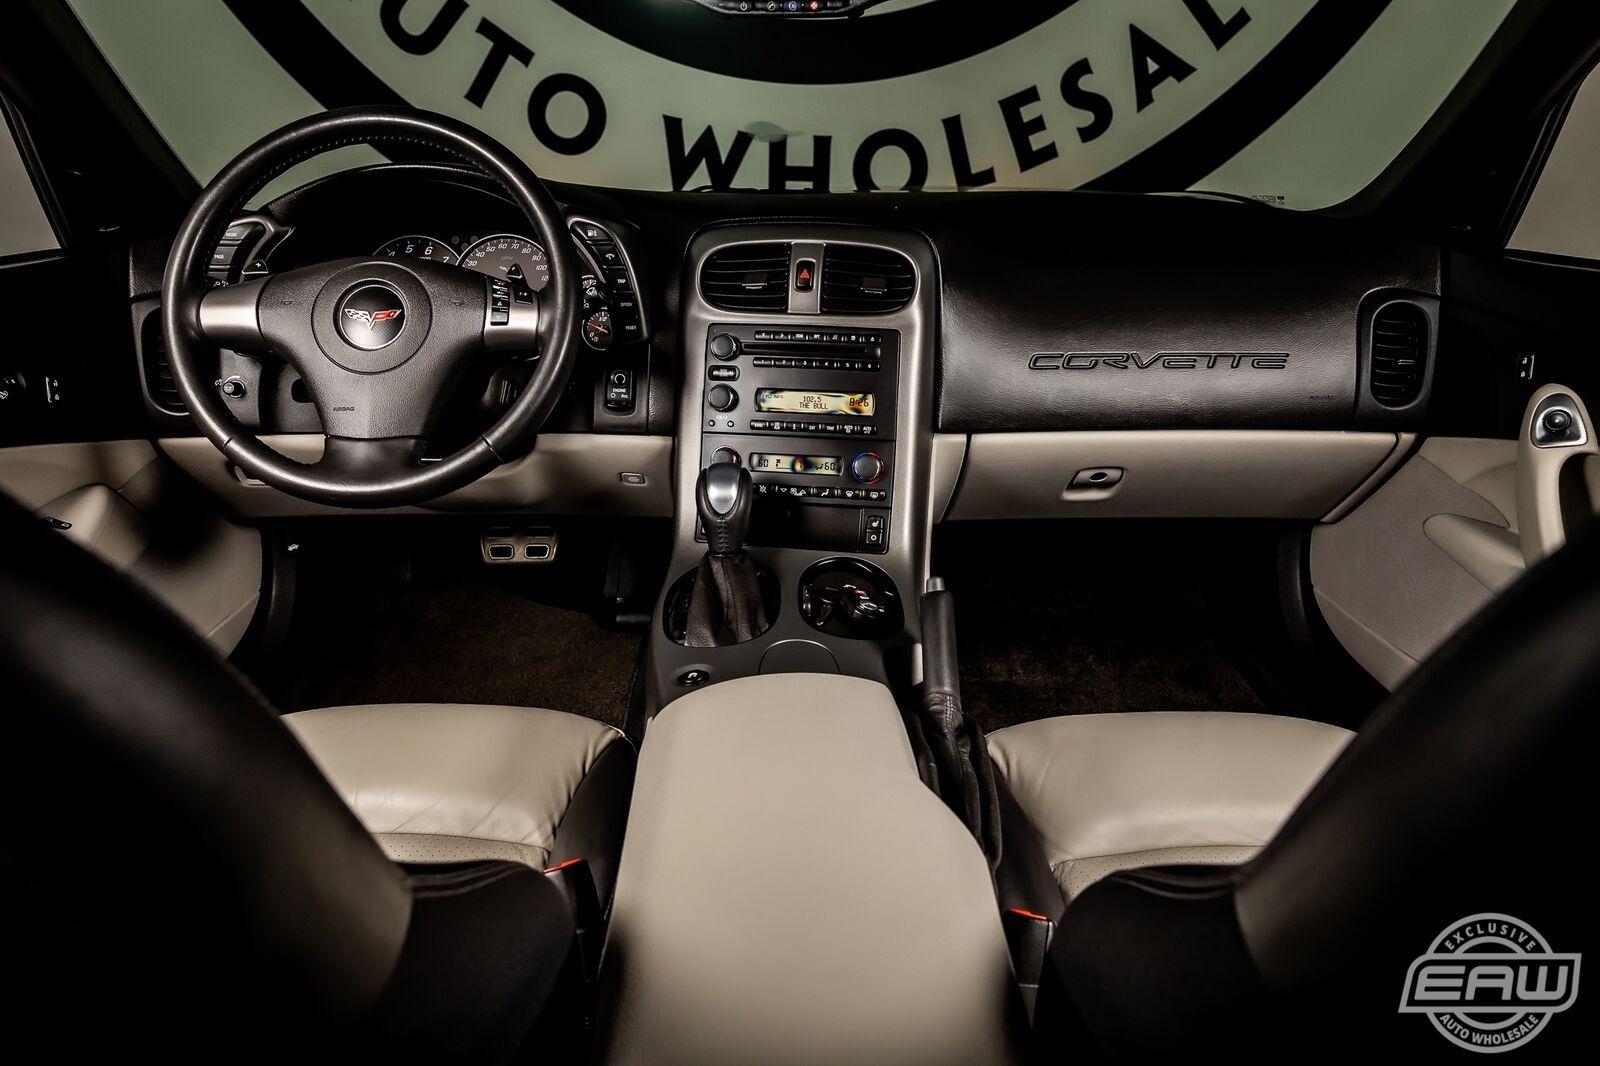 2007 Black Chevrolet Corvette Coupe  | C6 Corvette Photo 2